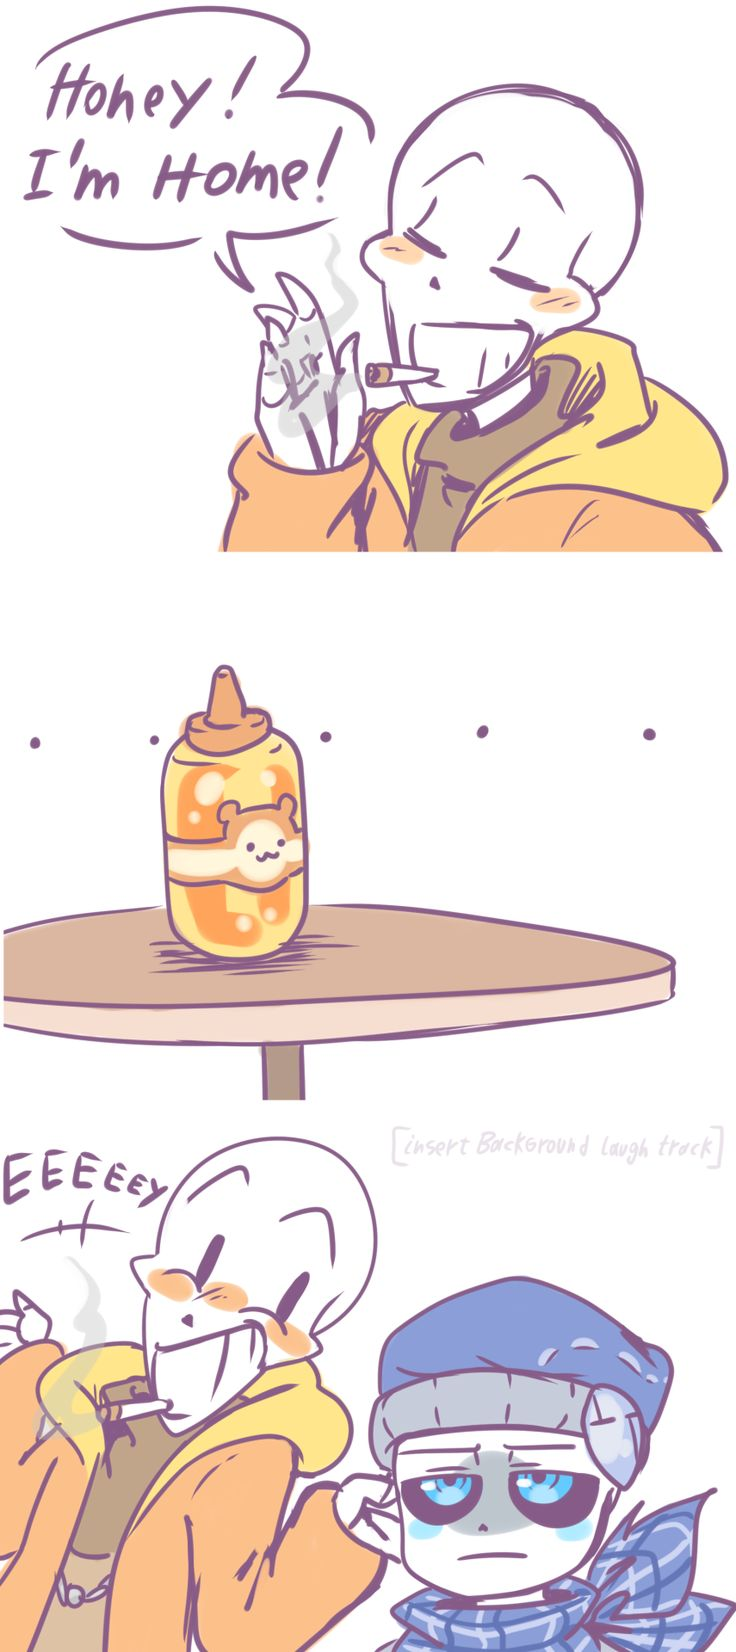 [old comic] sc!pap thinks he's punny again -3- • underswap/ popcornpr1nce • scvsbbb/ me